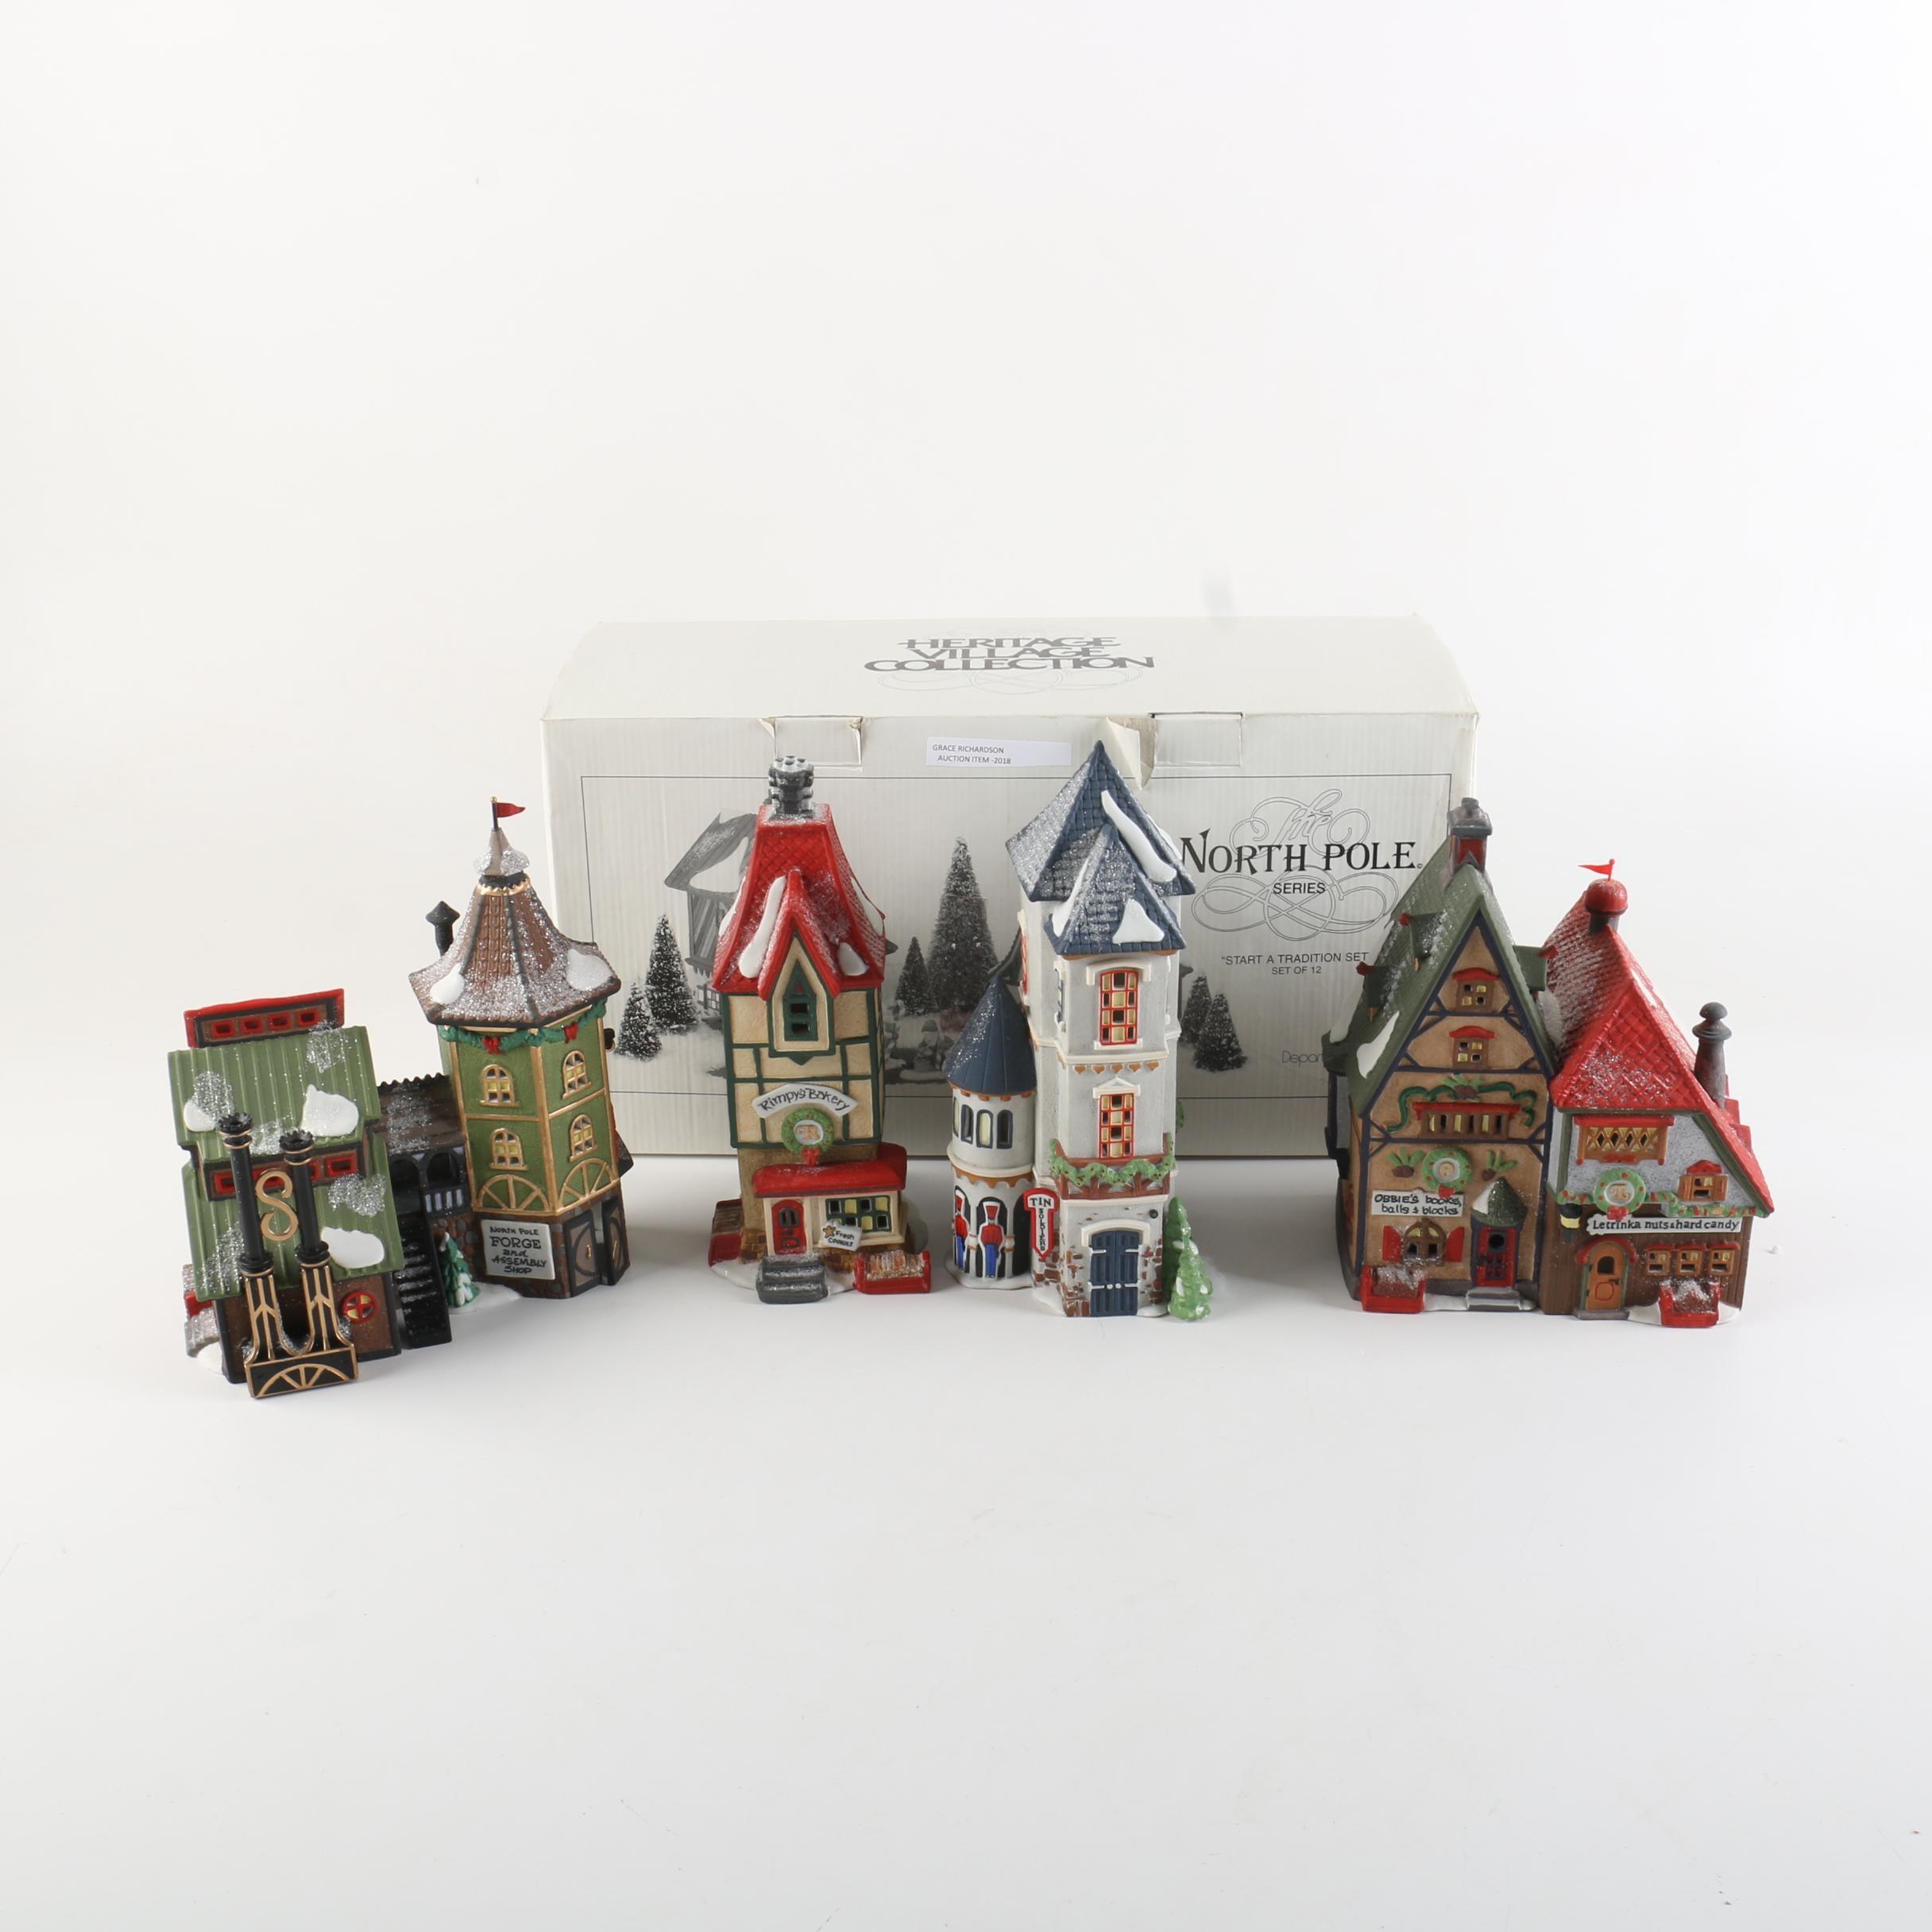 Department 56 North Pole Series Christmas Decor